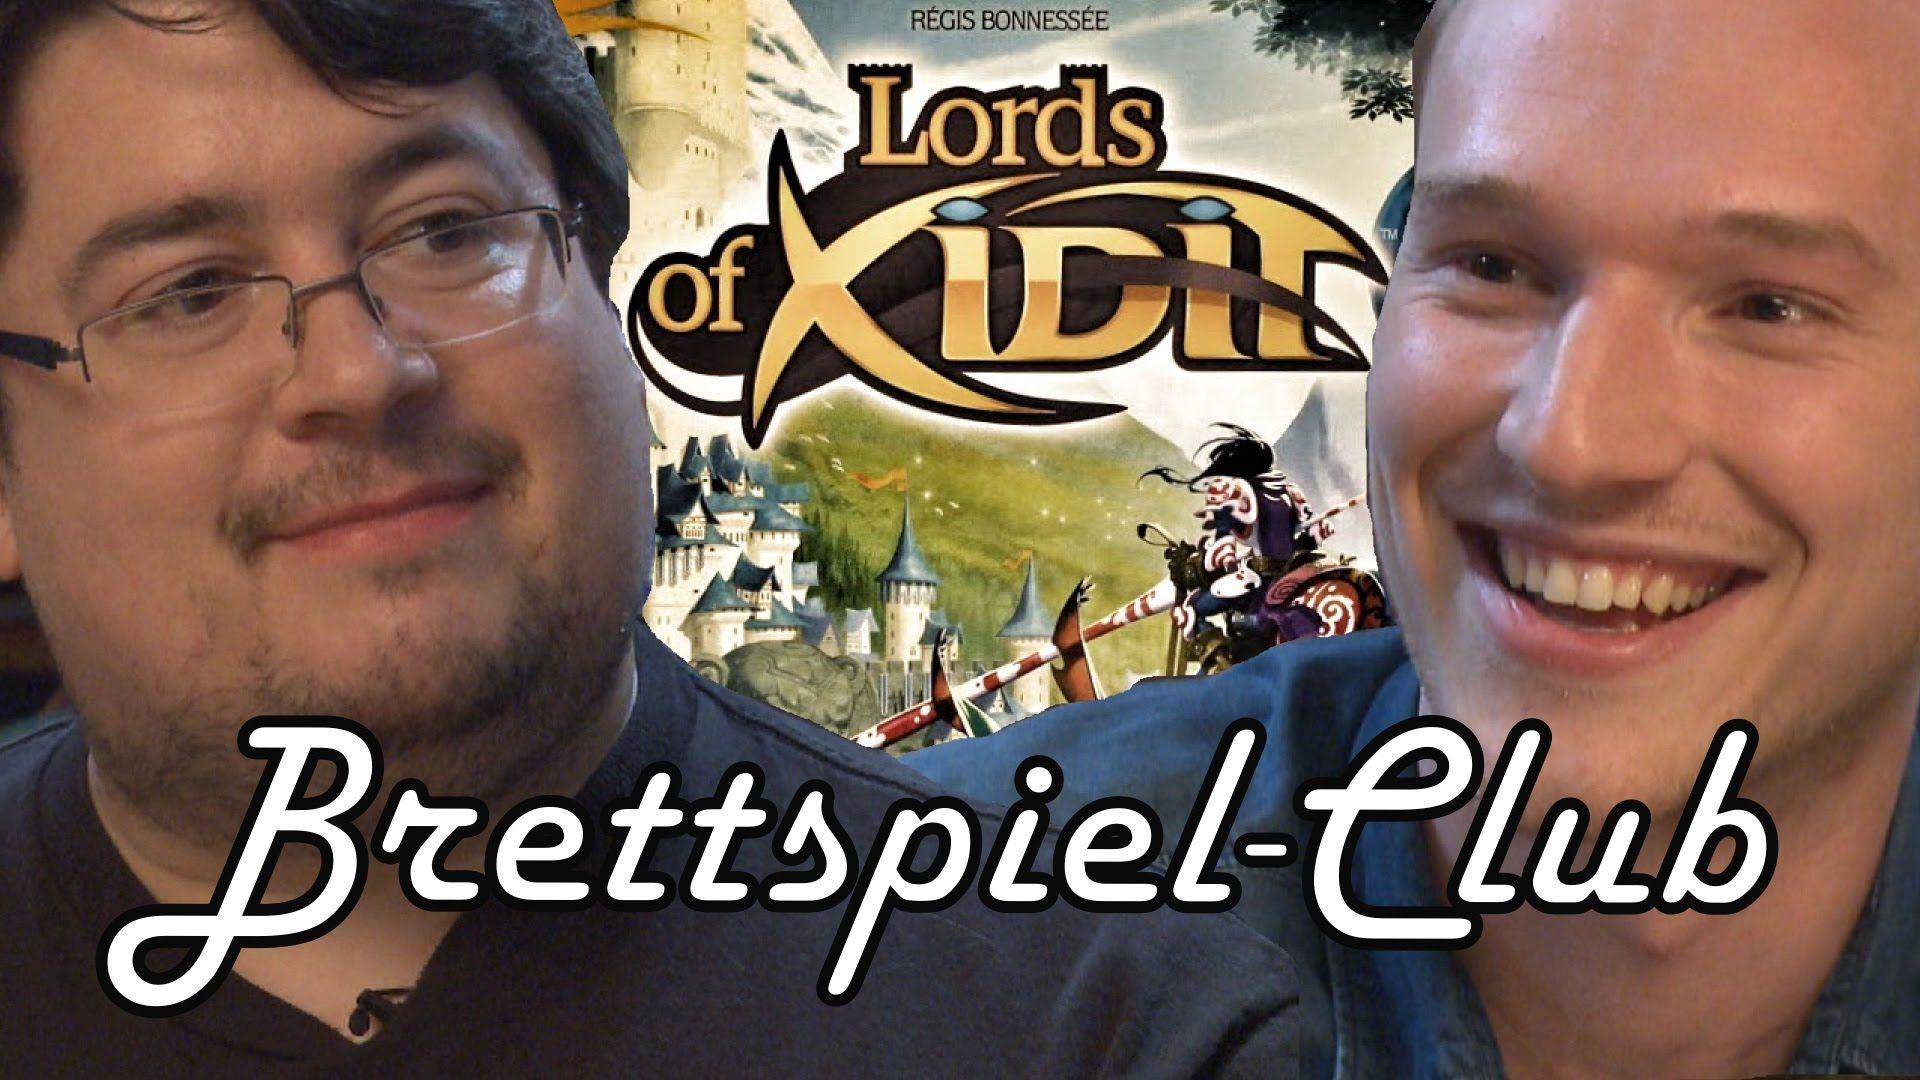 Lords of Xidit - Matthias Nagy und Lars Paulsen im Hunter & Cron Brettsp...